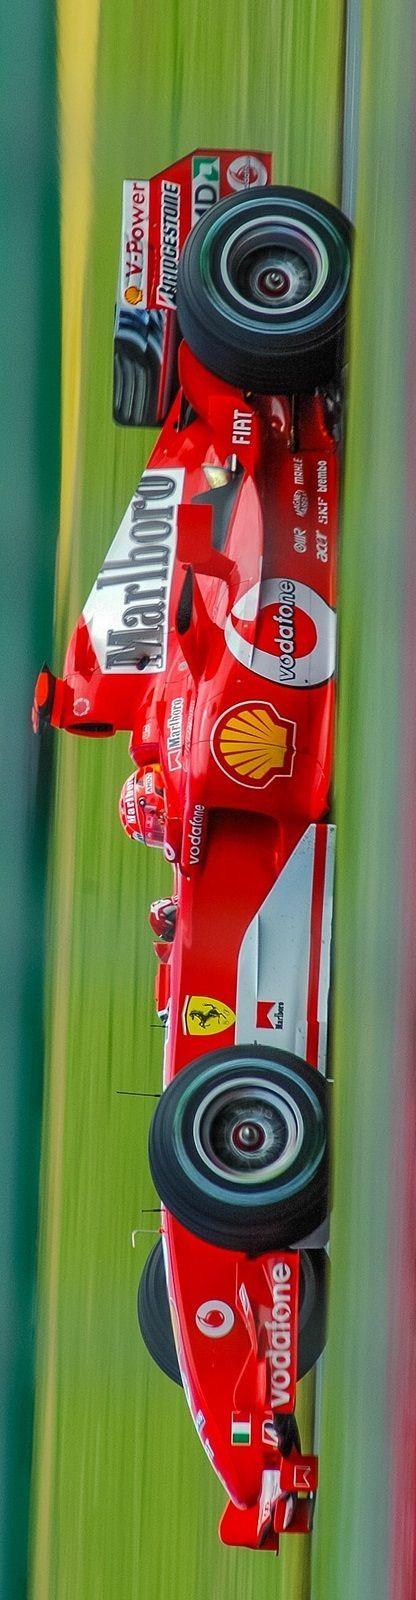 SPEED: F1 2004 Ferrari Michael Schumacher - https://www.luxury.guugles.com/speed-f1-2004-ferrari-michael-schumacher-2/